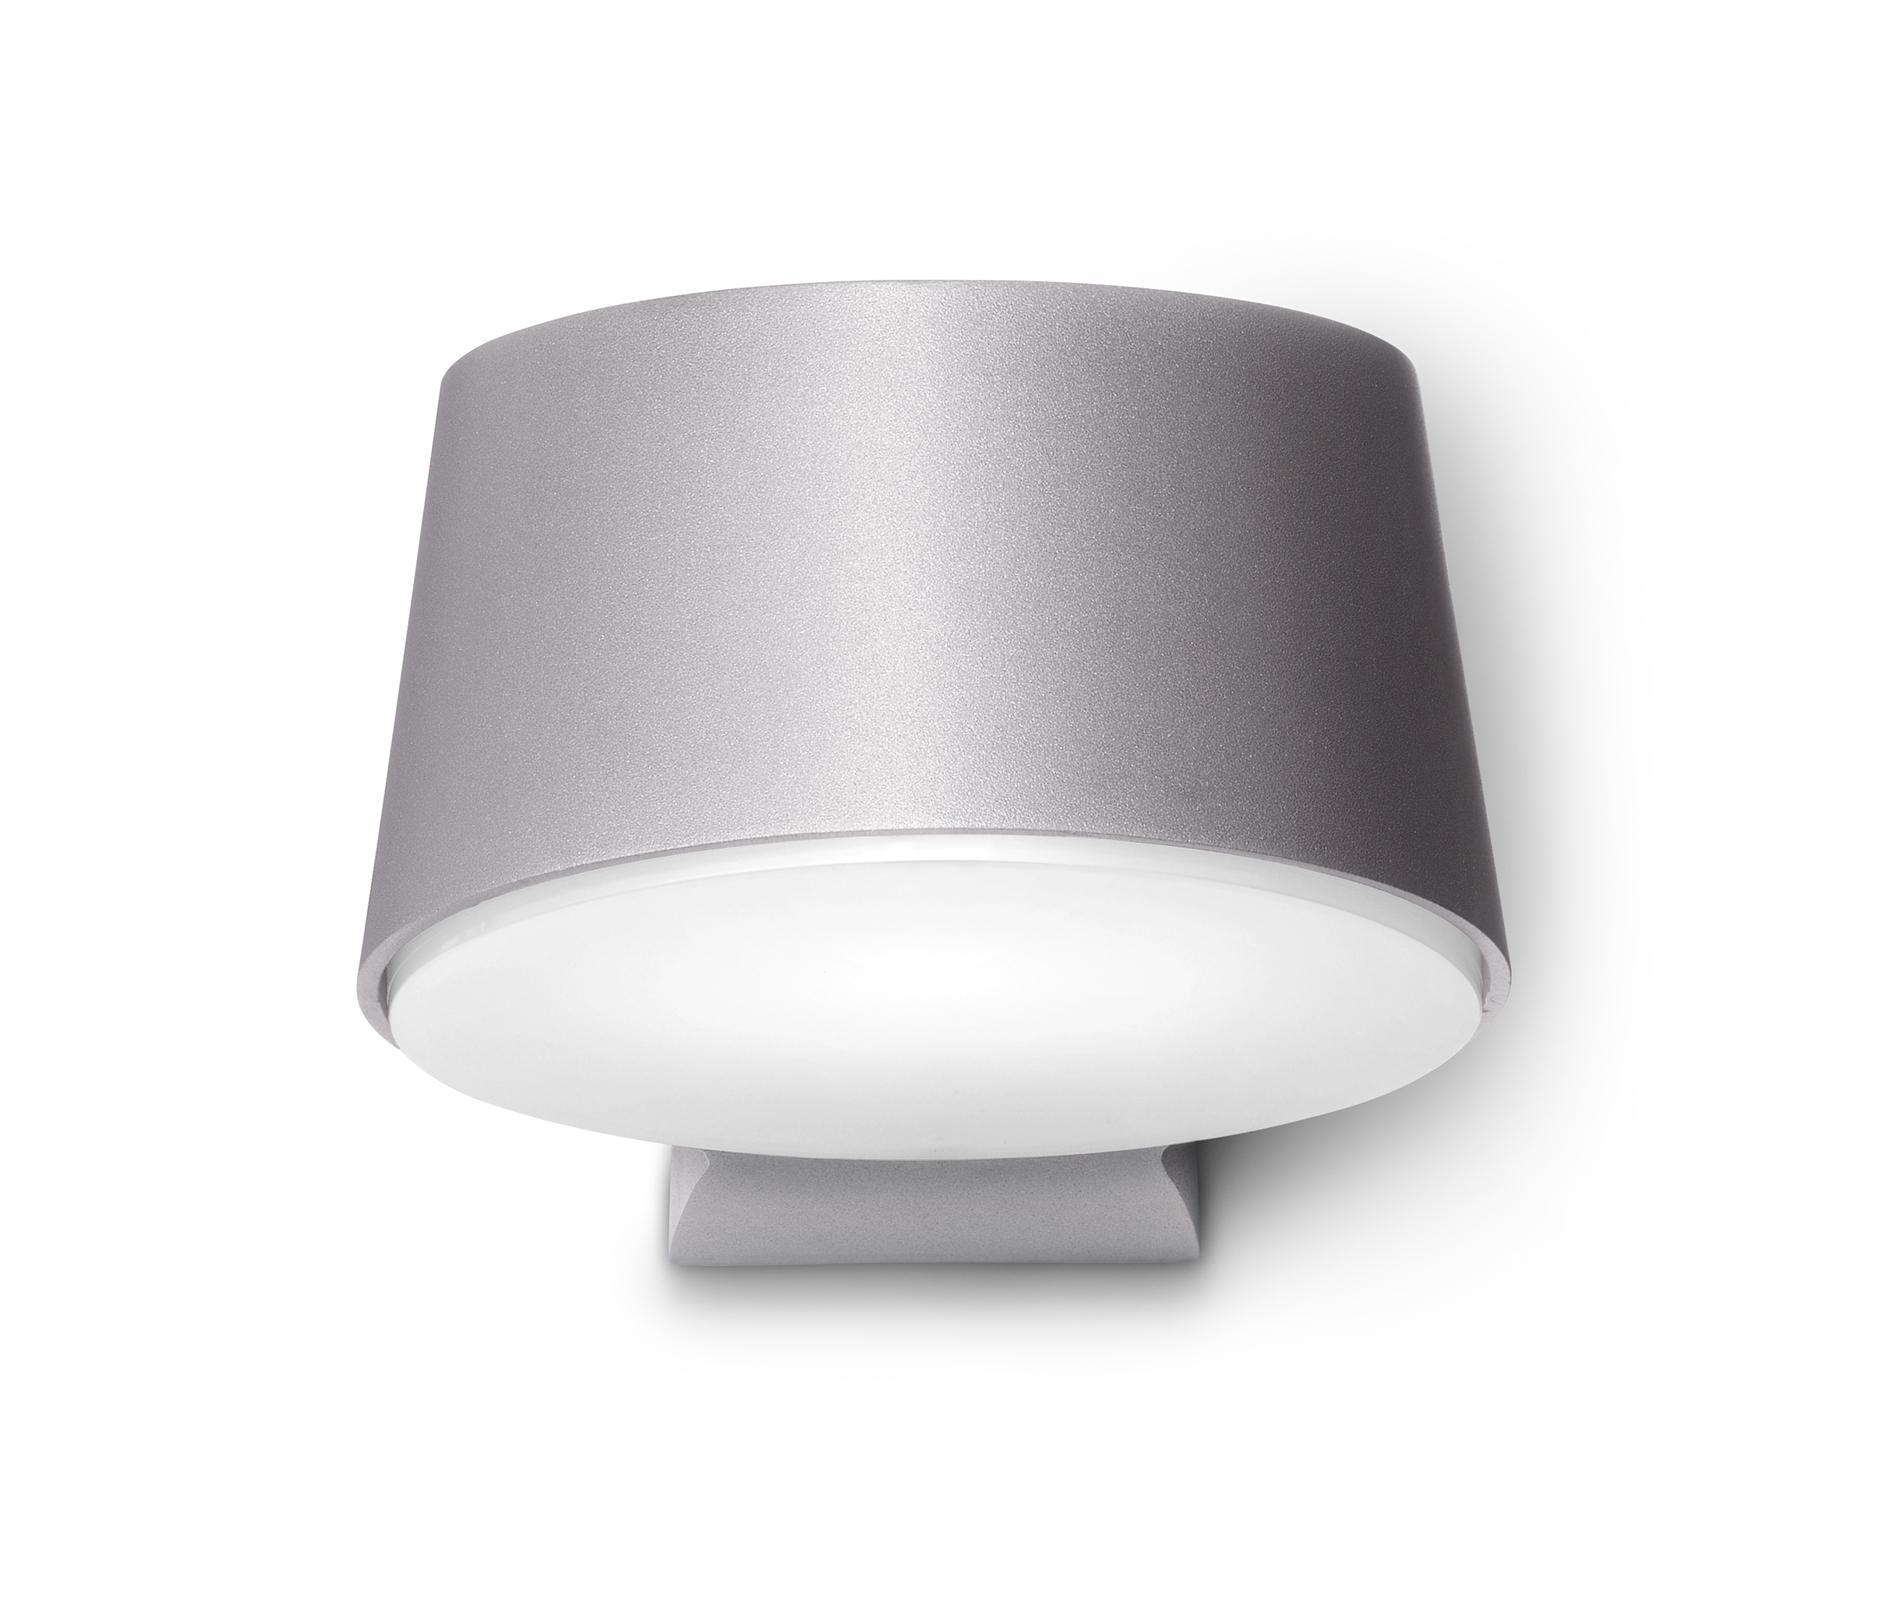 Nyx 190 wall by FOCUS Lighting | General lighting ...  sc 1 st  Architonic & NYX 190 WALL - General lighting from FOCUS Lighting | Architonic azcodes.com